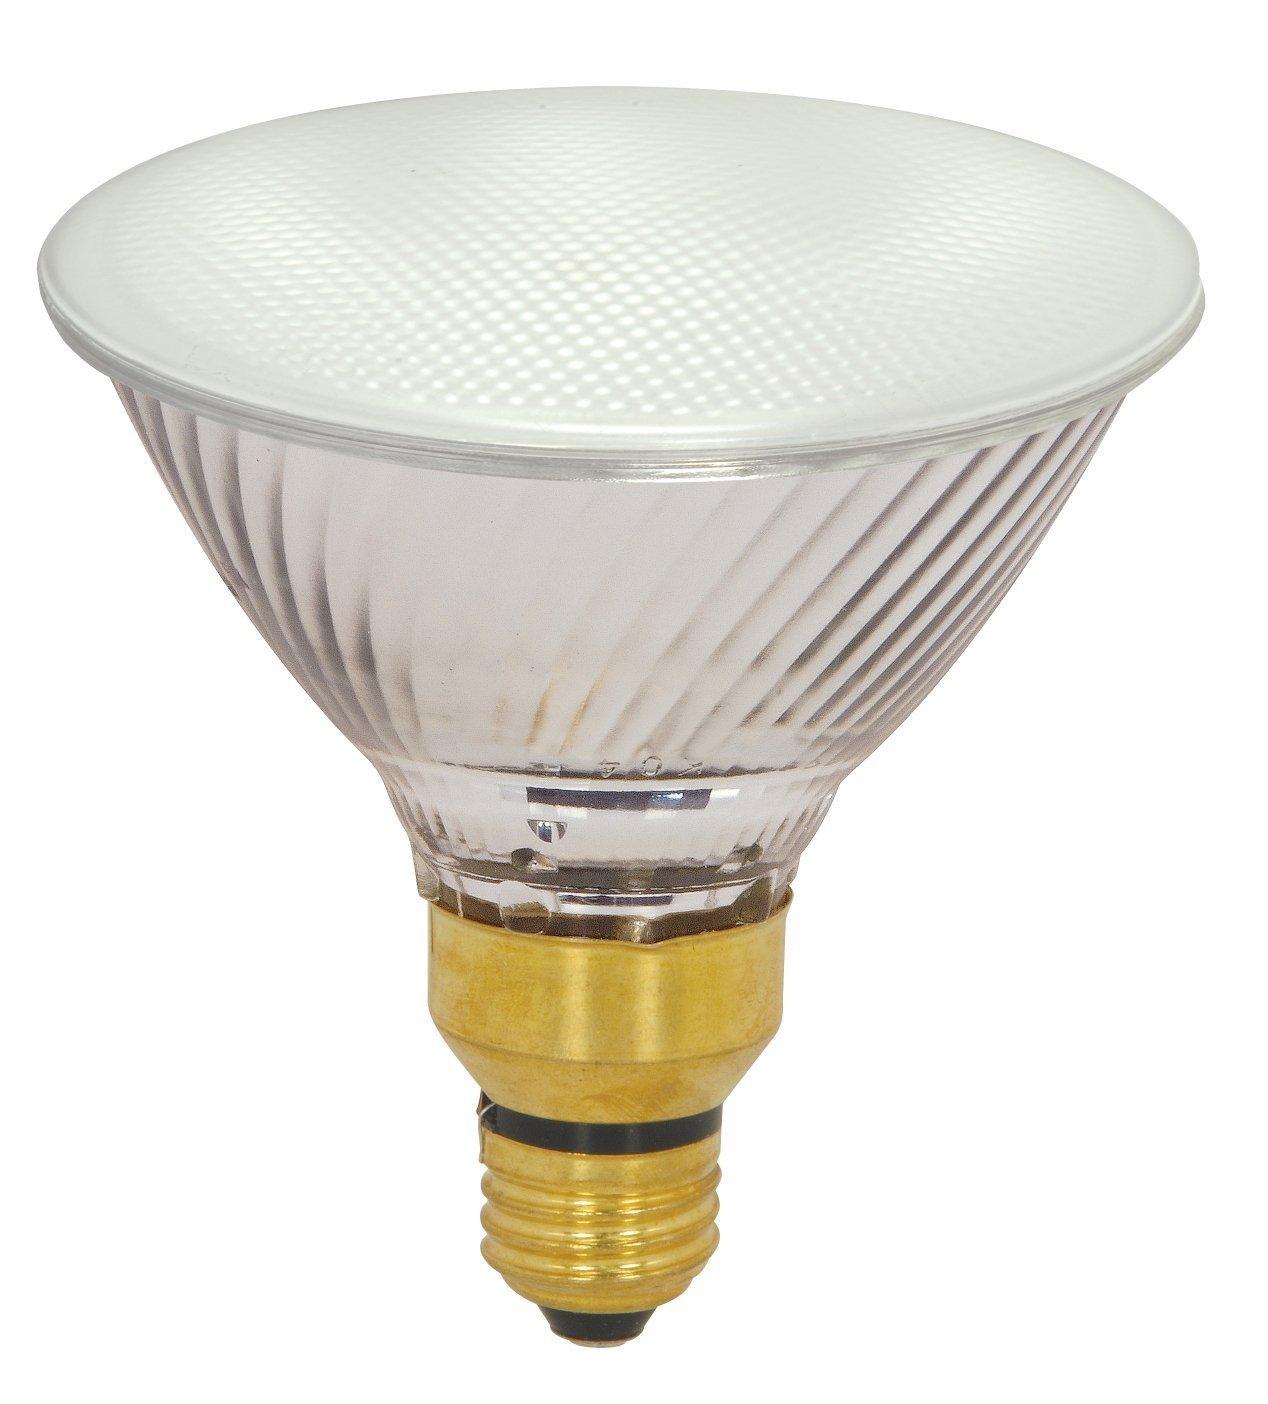 (Case of 15) Satco S4133 39 Watt 500 Lumens PAR38 Halogen Flood 42 Degrees Frosted Light Bulb, Dimmable